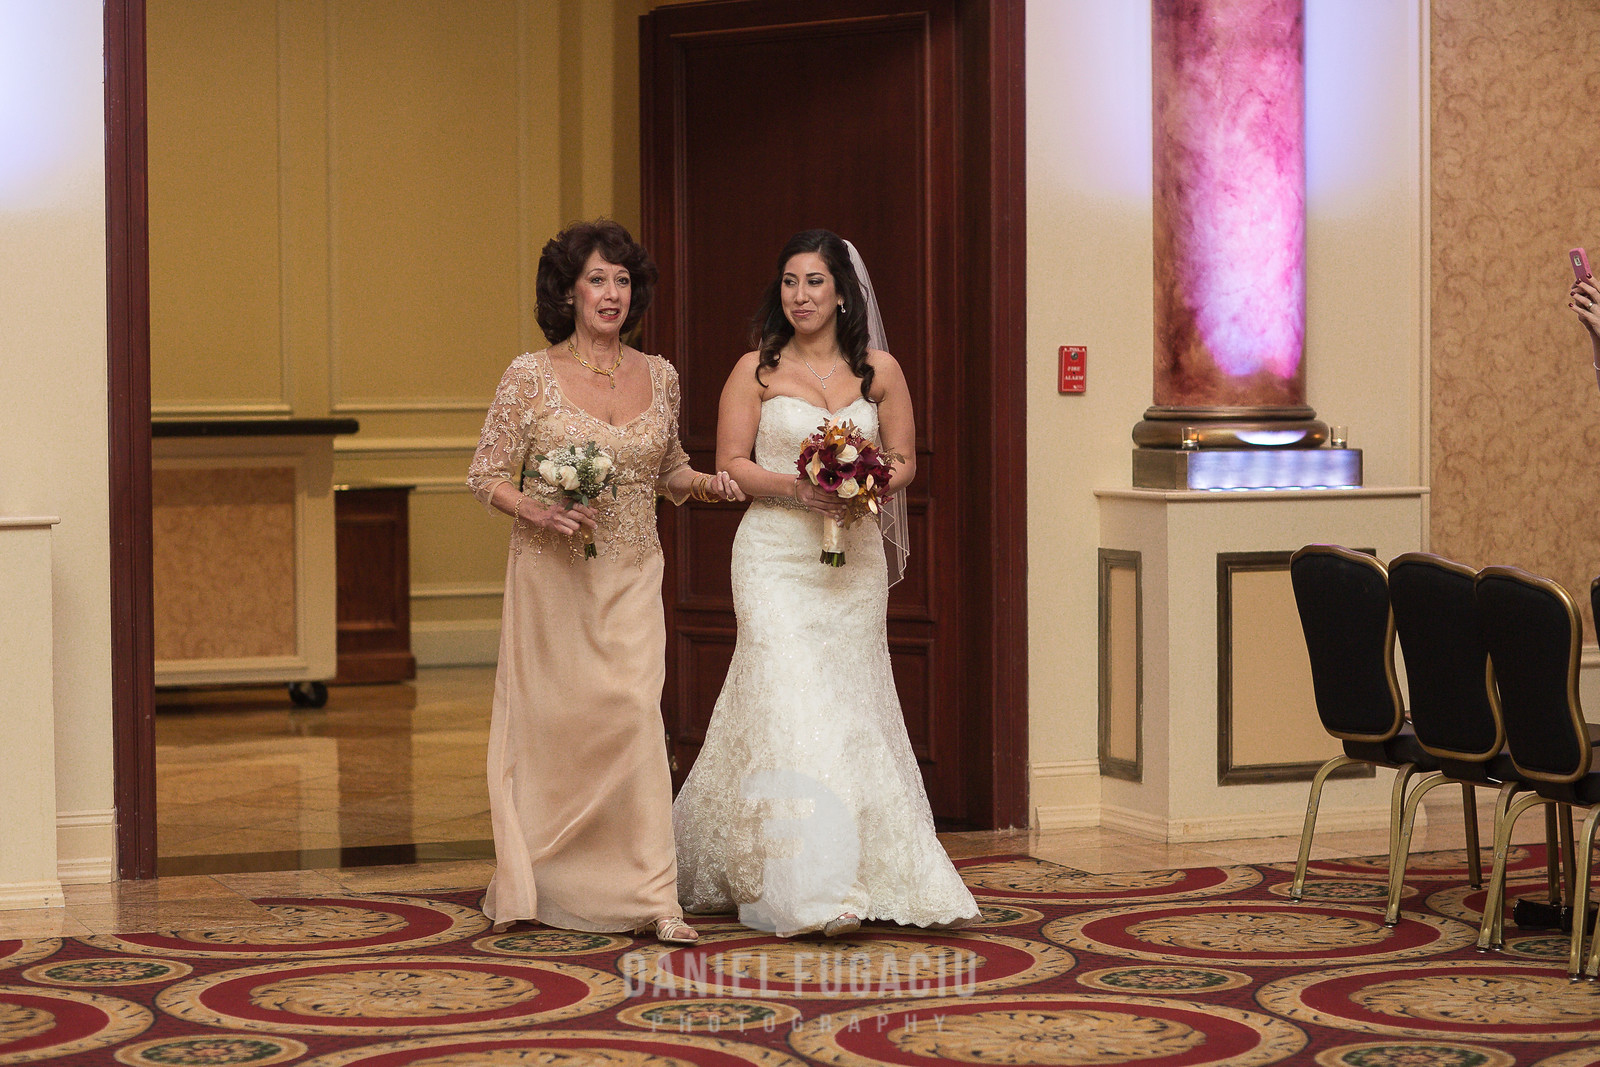 Daniel_Fugaciu_Photography_Liz_Rob_Real_Weddding_April_Lynn_Designs_The_Merion_New_Jersey_Brugundy_Gold_Wedding20-2